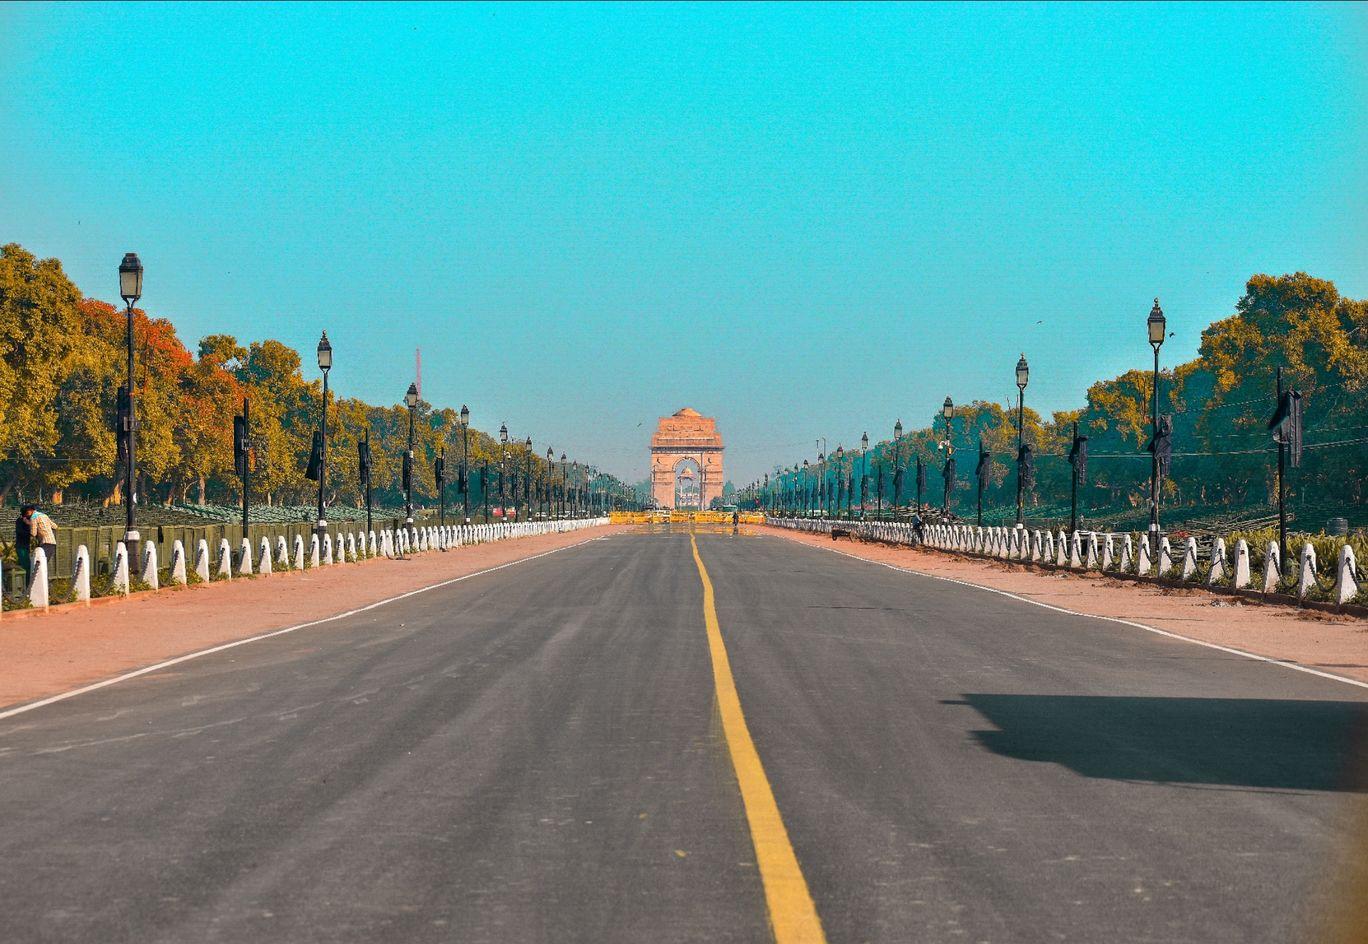 Photo of New Delhi By Divya Darshan Chhetri